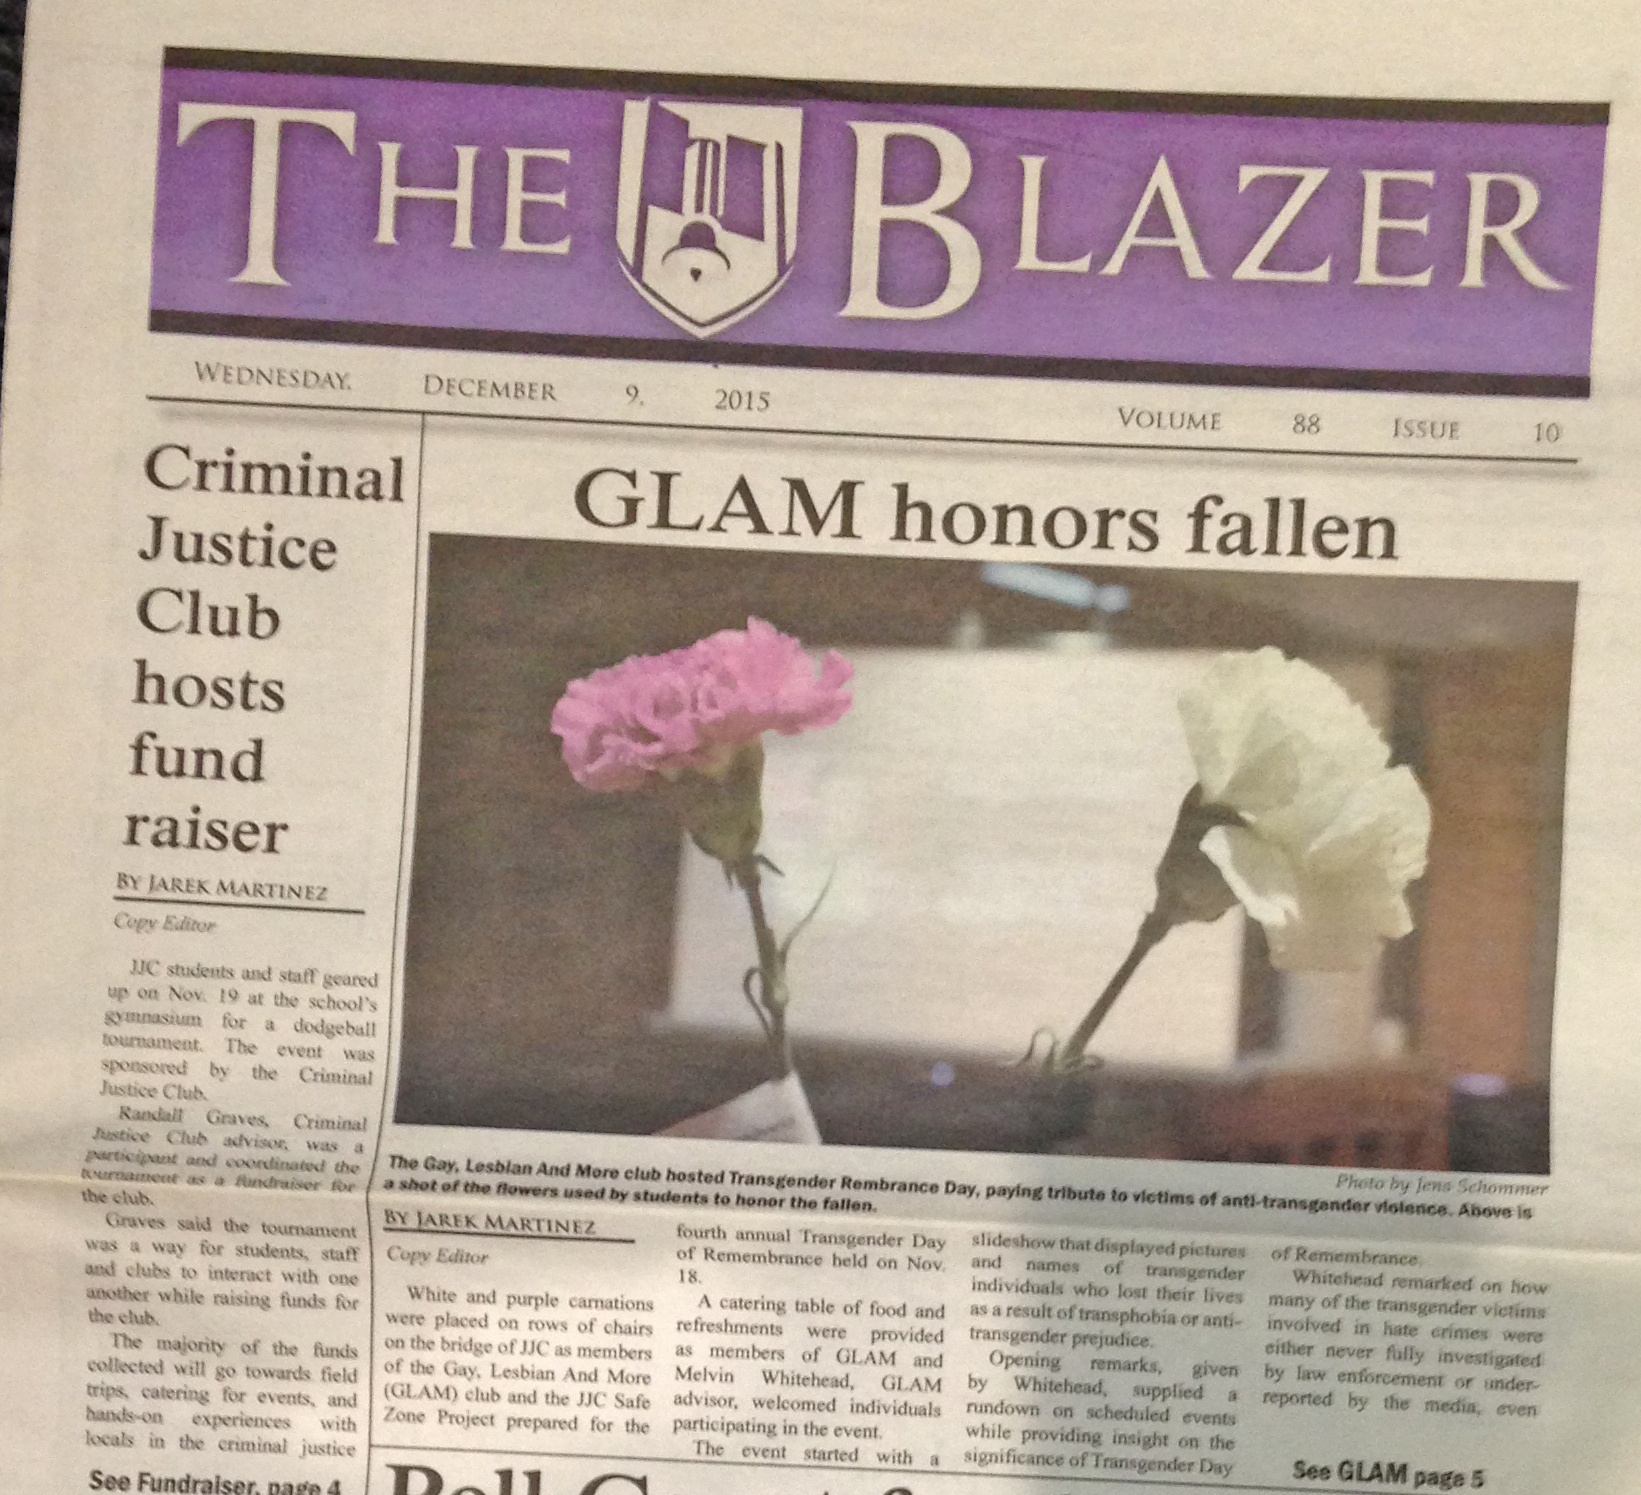 2015_Edition_of_the_Blazer2.jpg